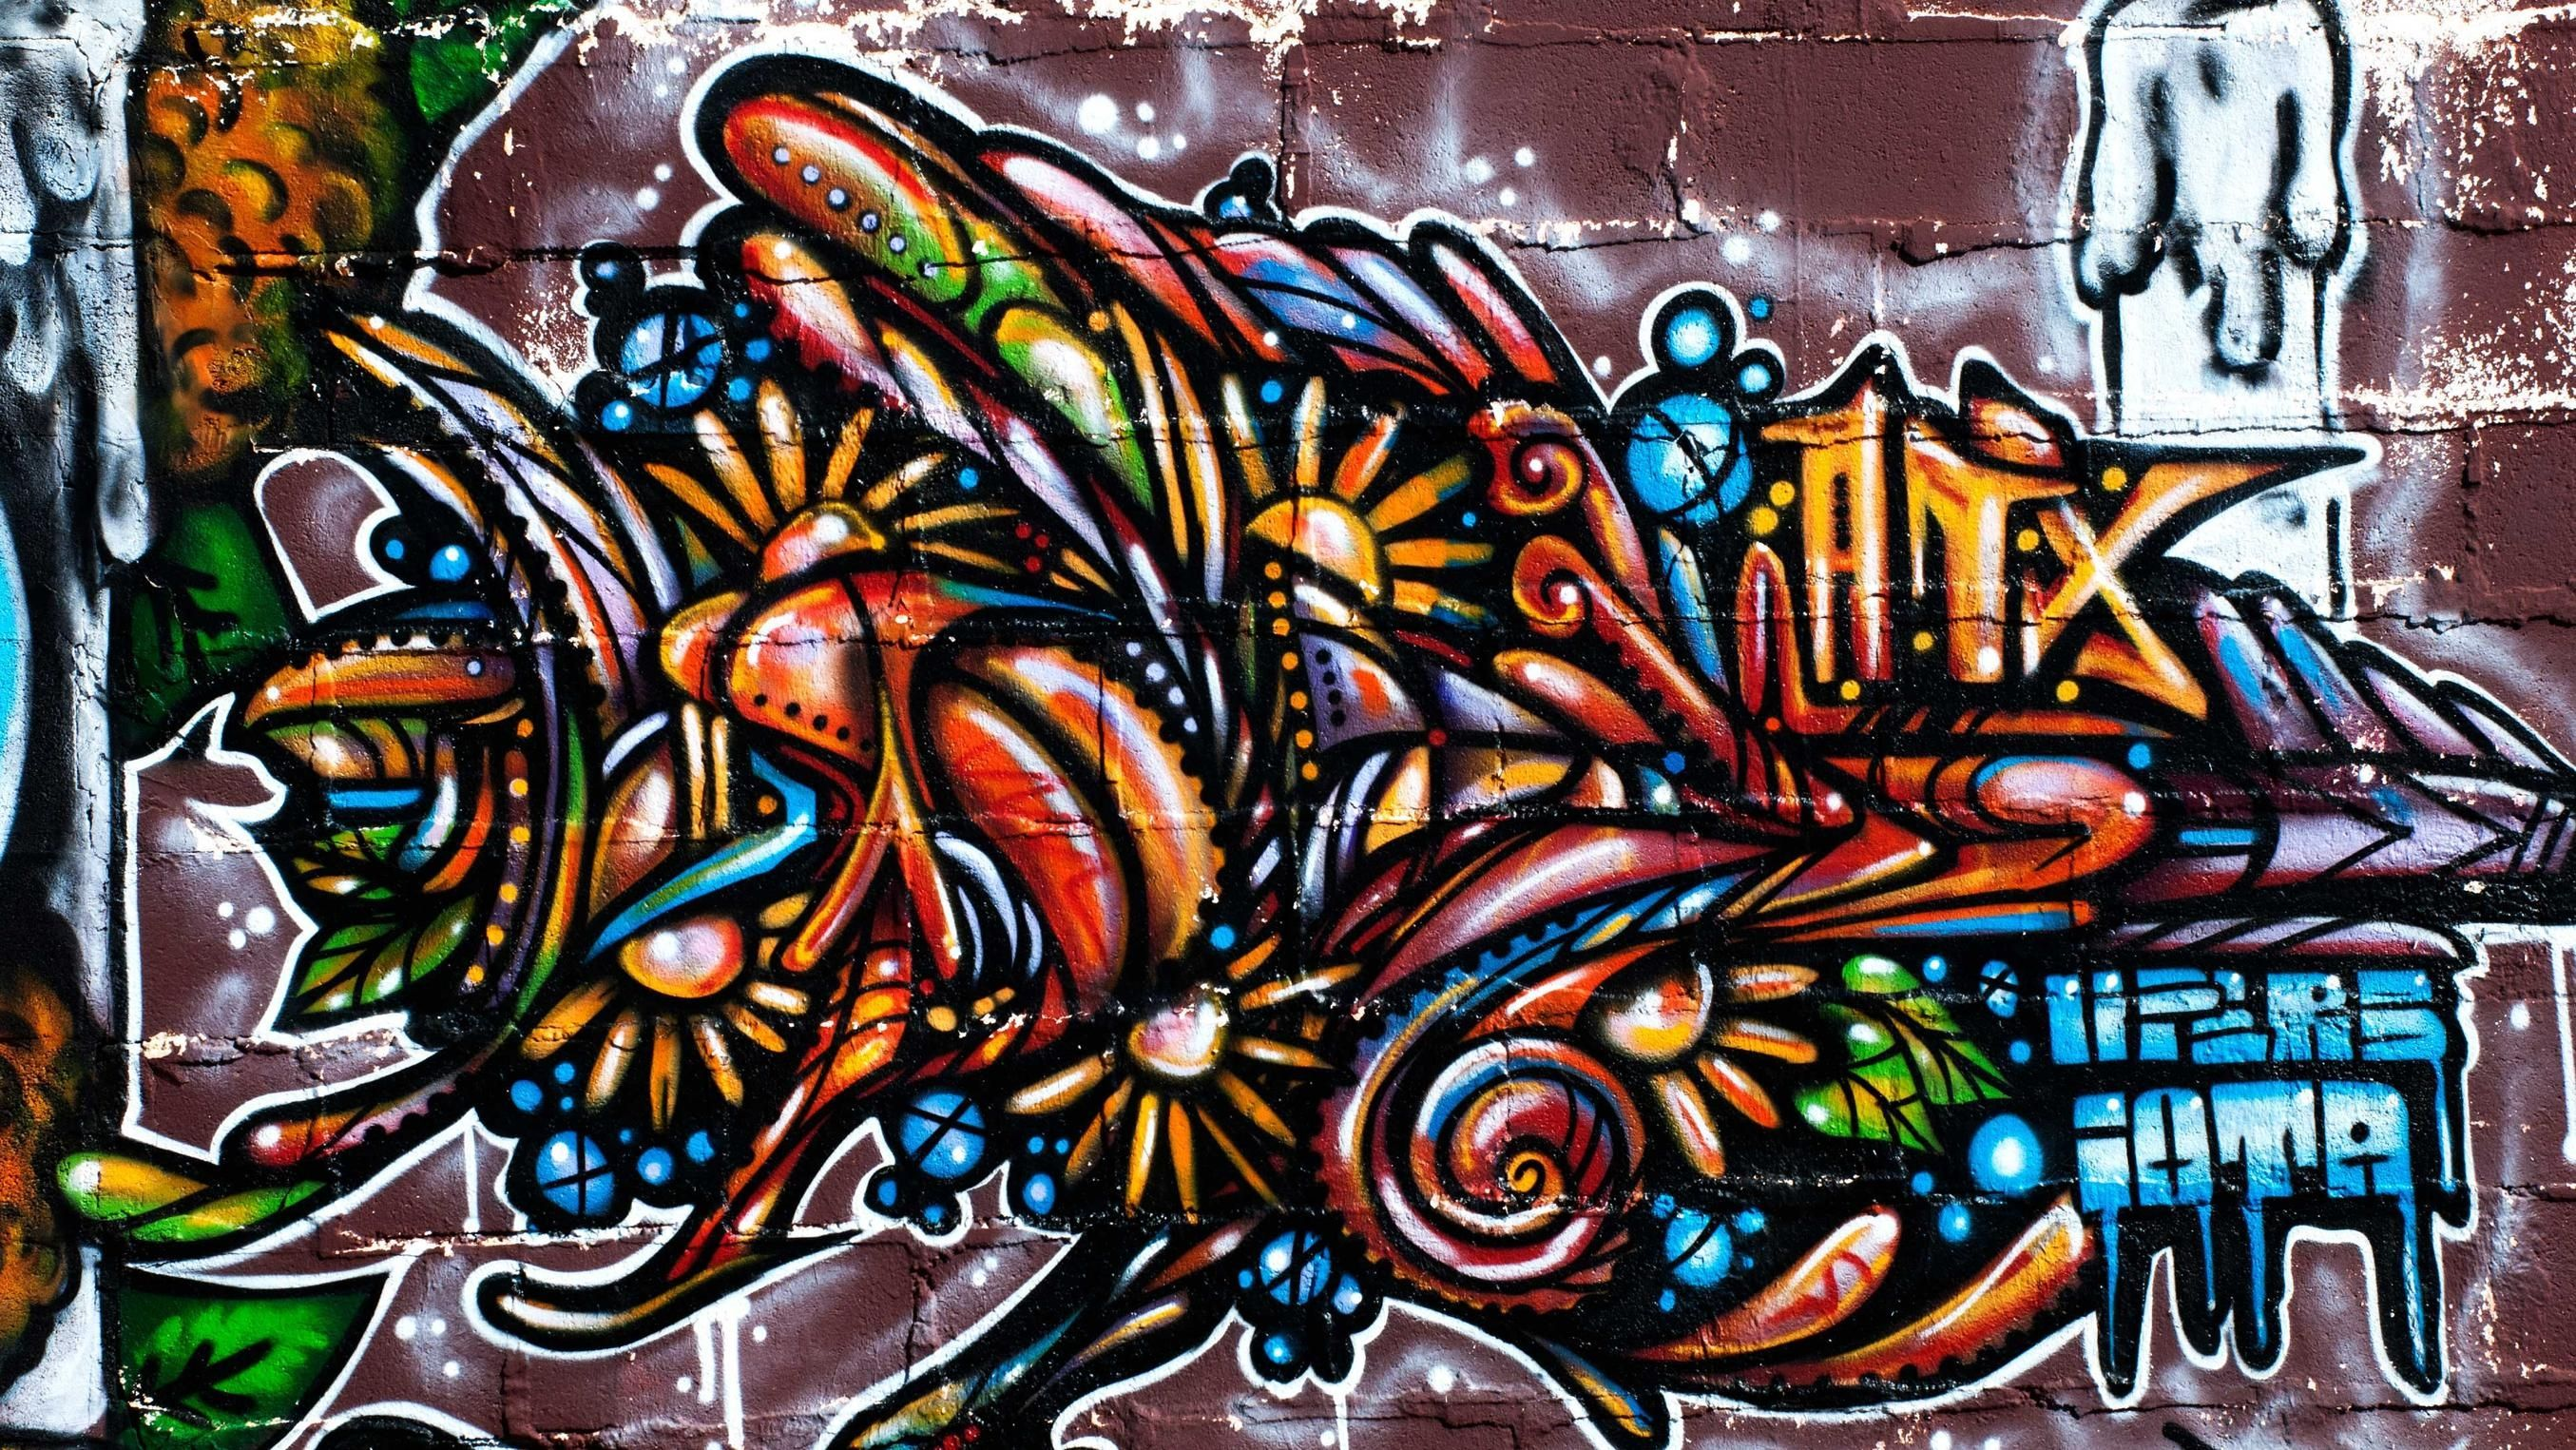 Cool backgrounds graffiti hd download cool backgrounds graffiti cool backgrounds graffiti hd download cool backgrounds graffiti download cool backgrounds graffiti hd download voltagebd Image collections